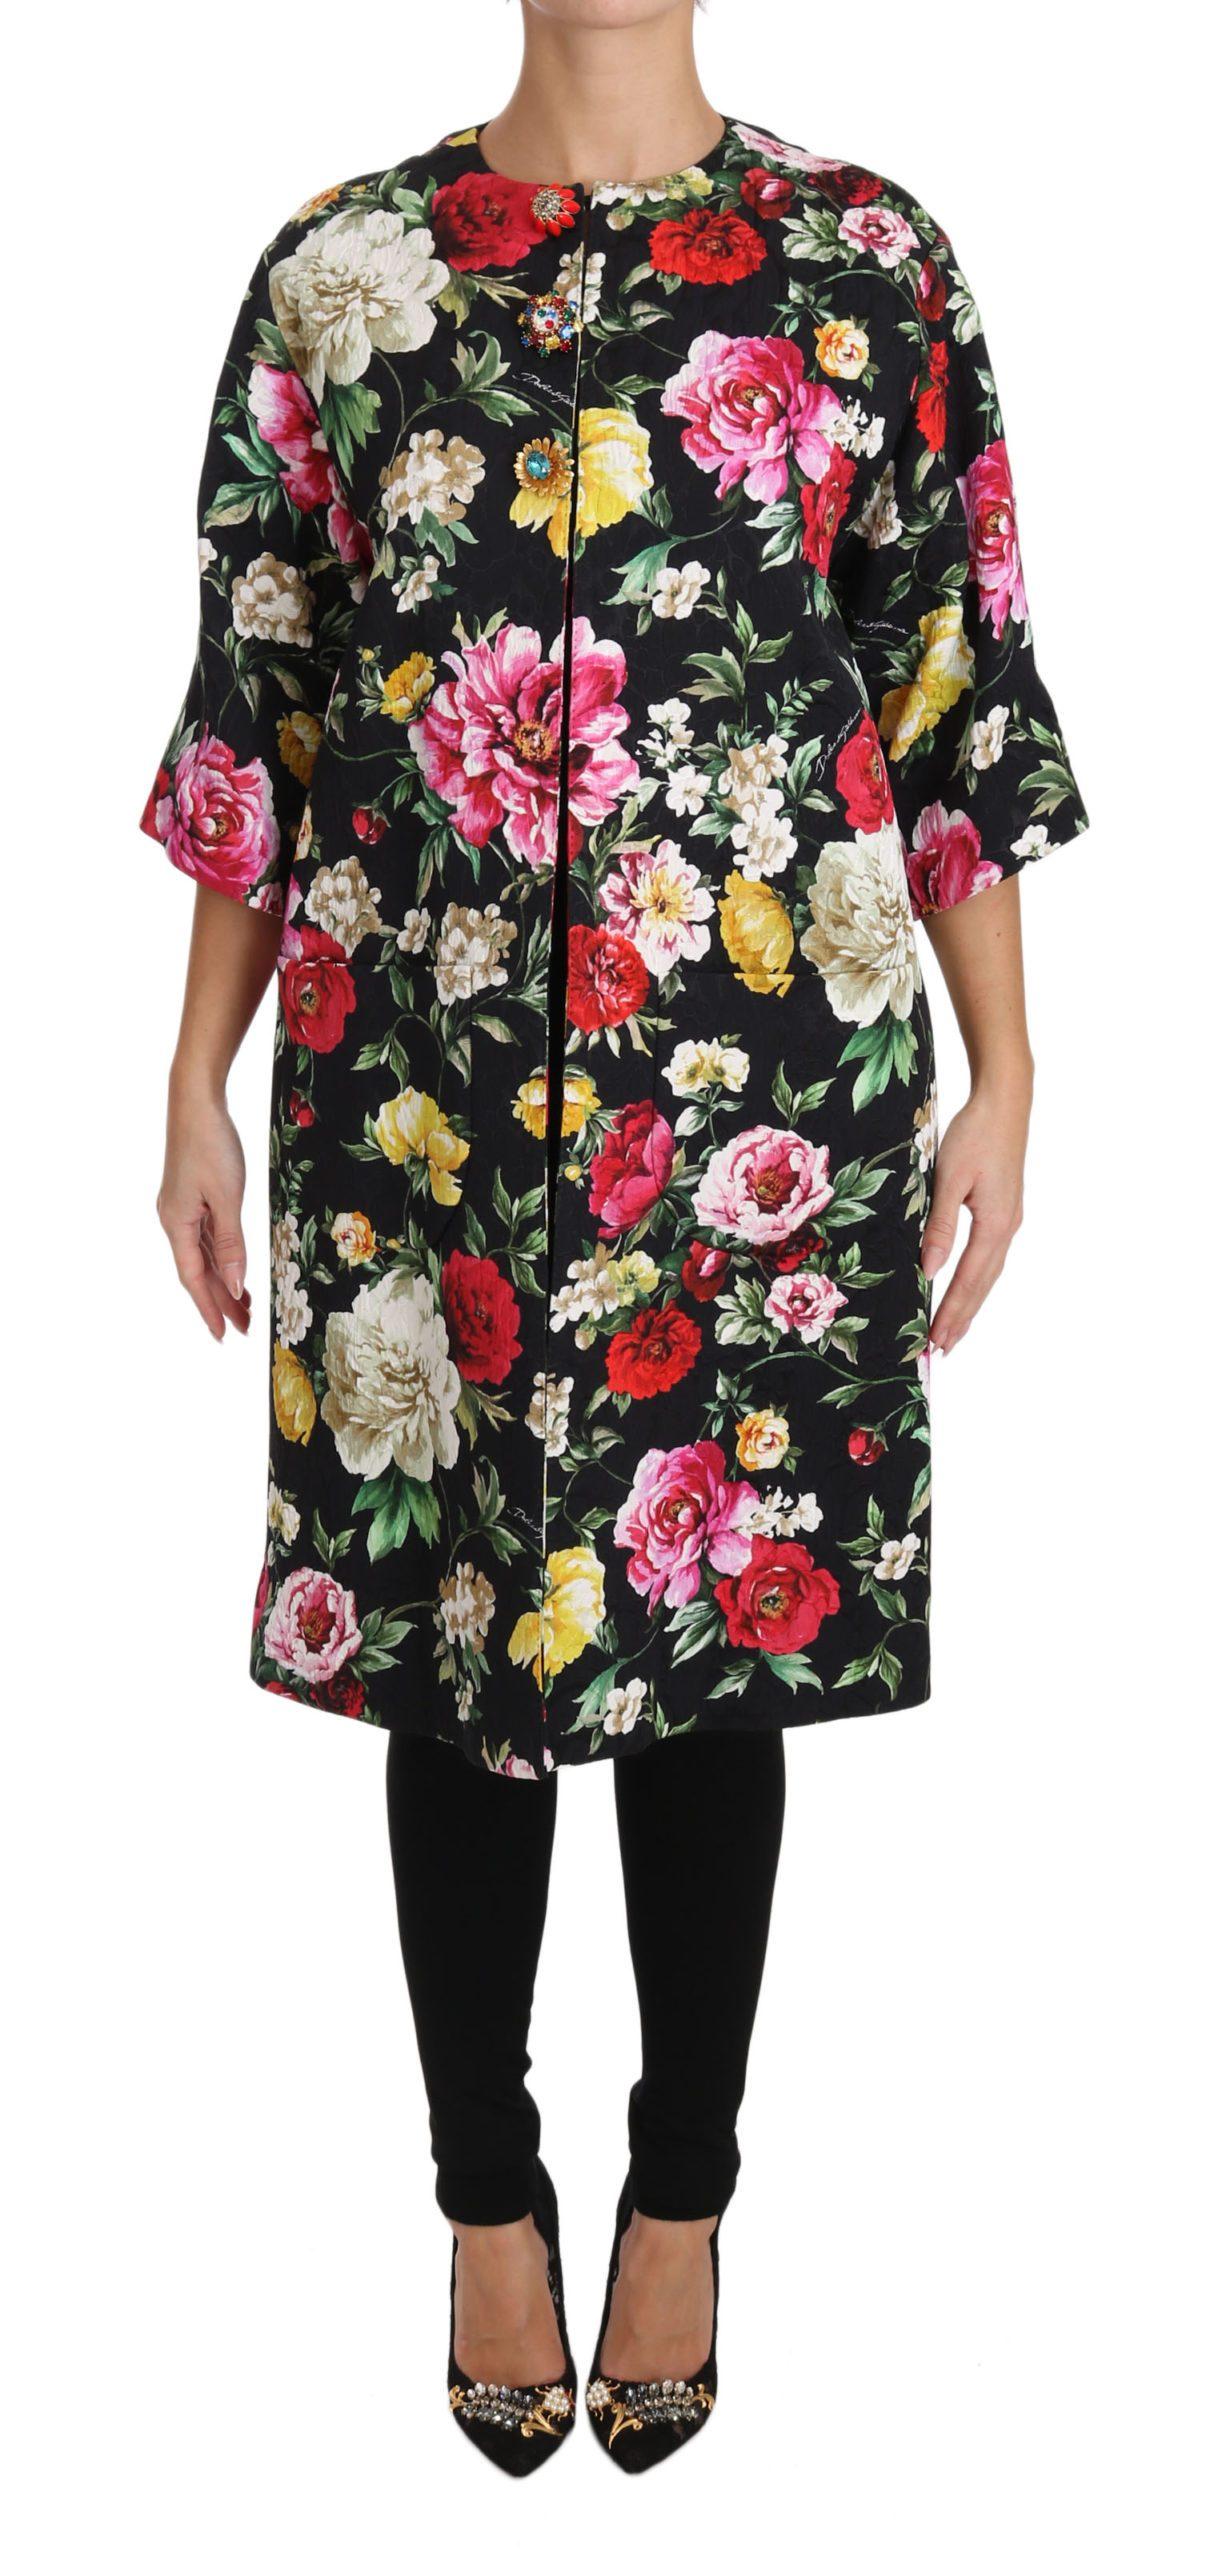 Dolce & Gabbana Women's Floral Crystal Jacquard Coat Black JKT2316 - IT36 | XS